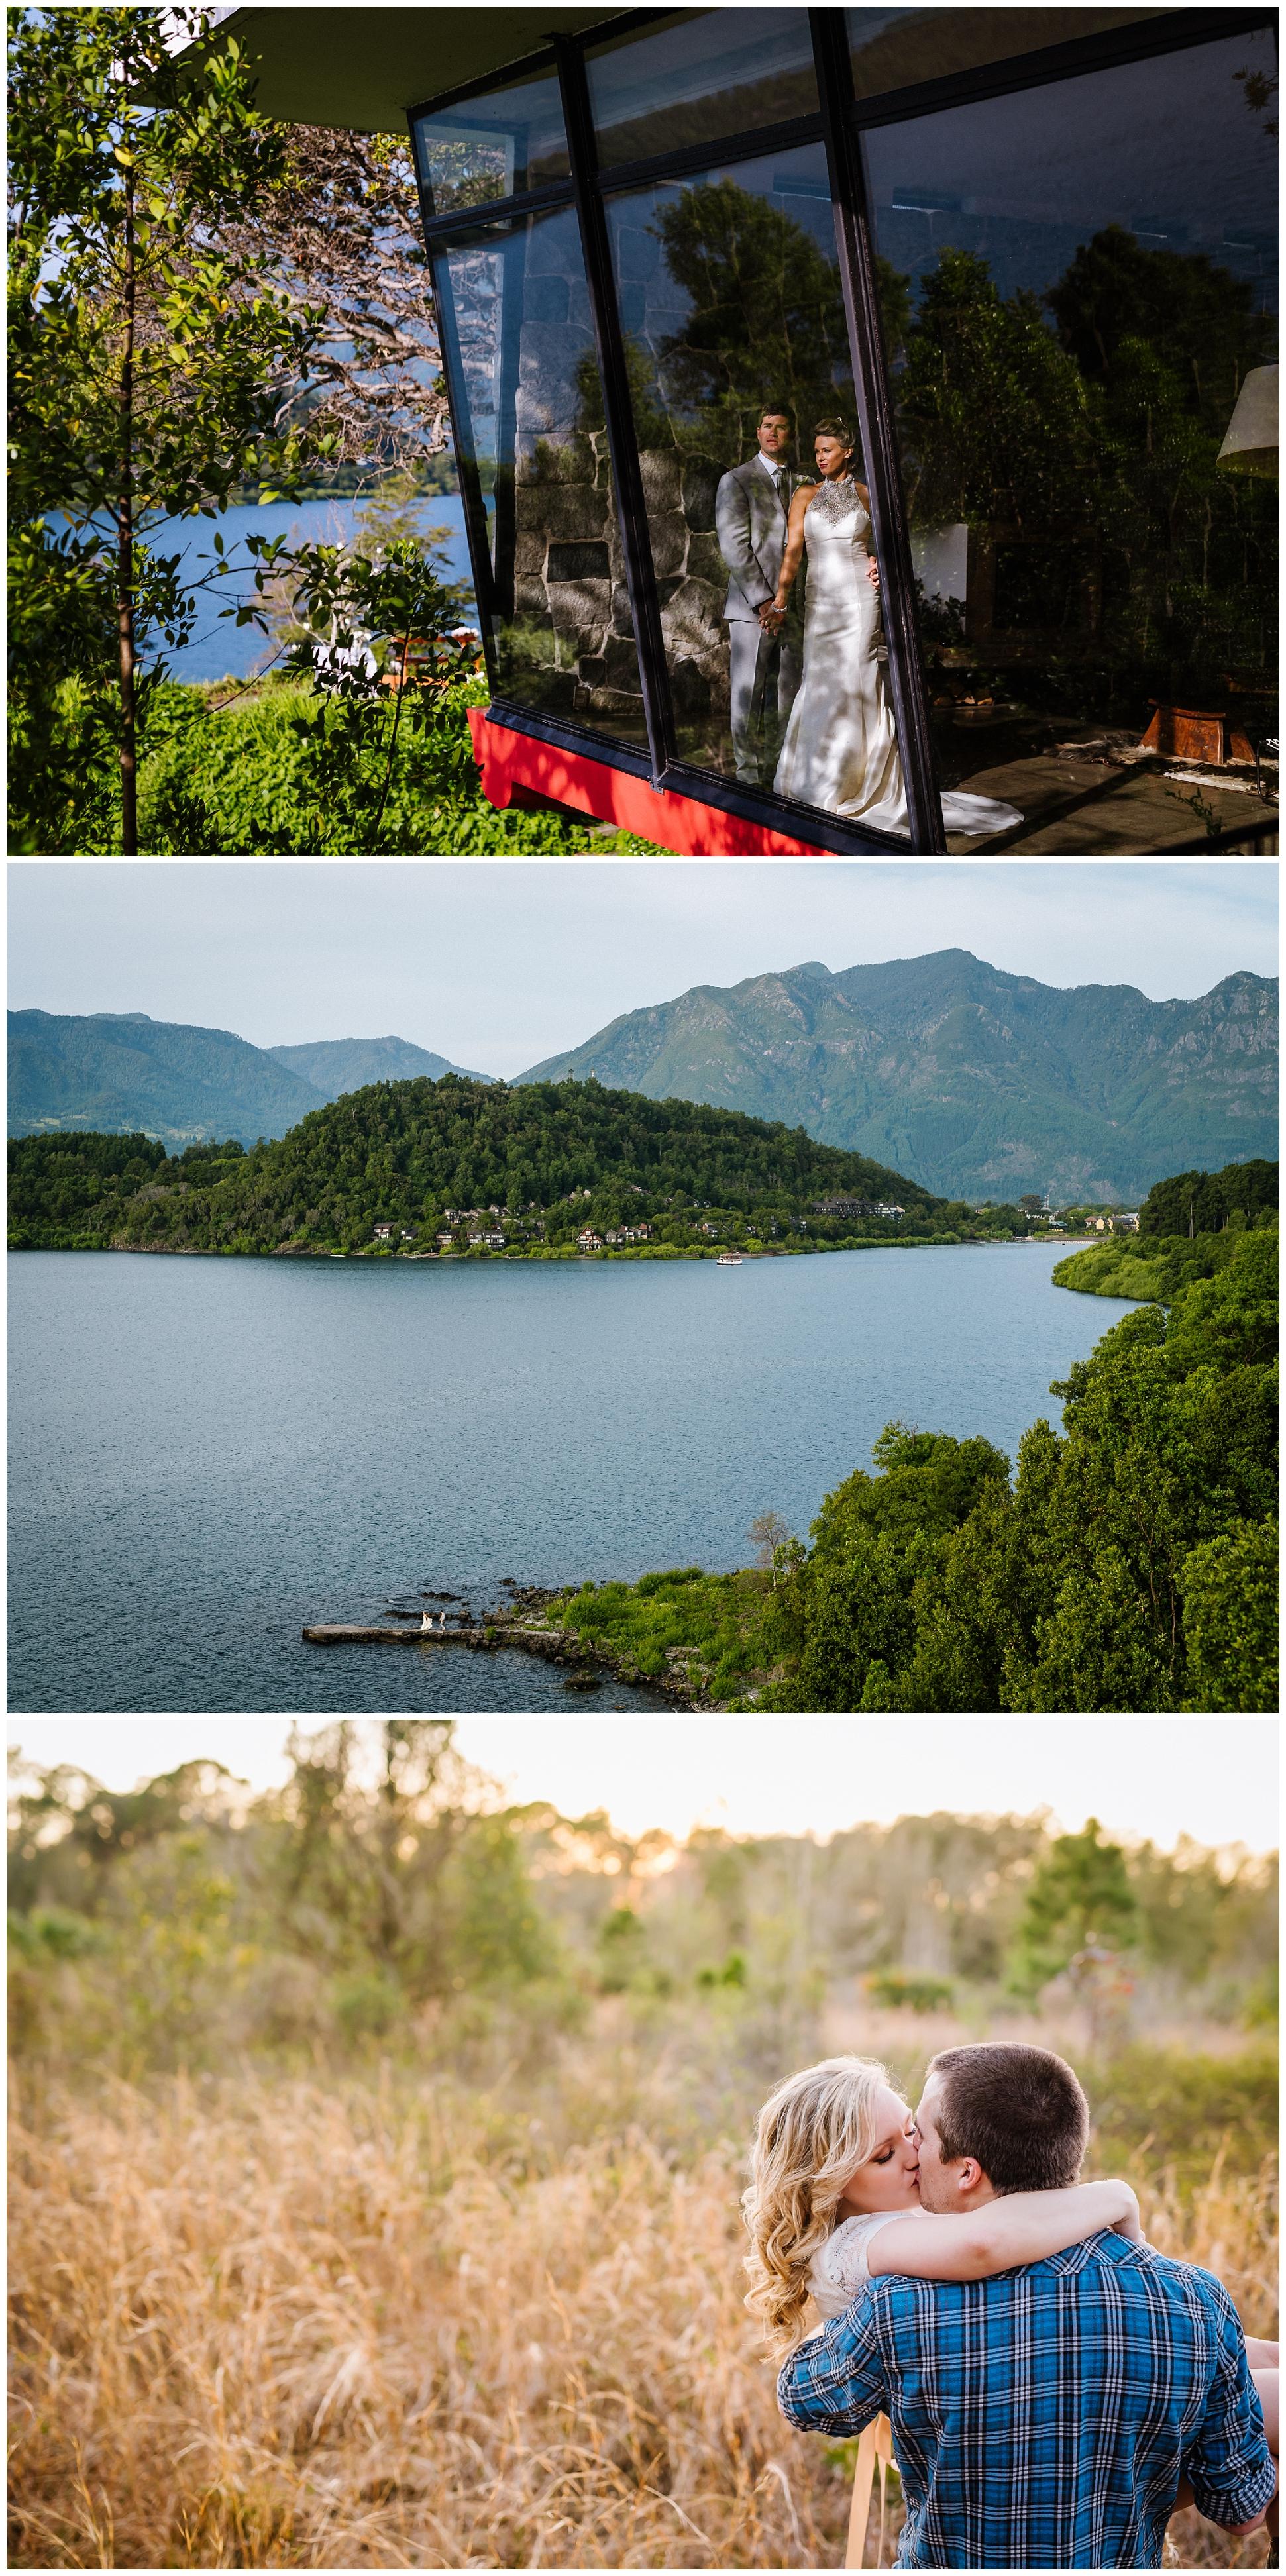 Ashlee-hamon-photography-year-in-review-2016-travel-wanderlust-vsco-adventure-wedding_0080.jpg